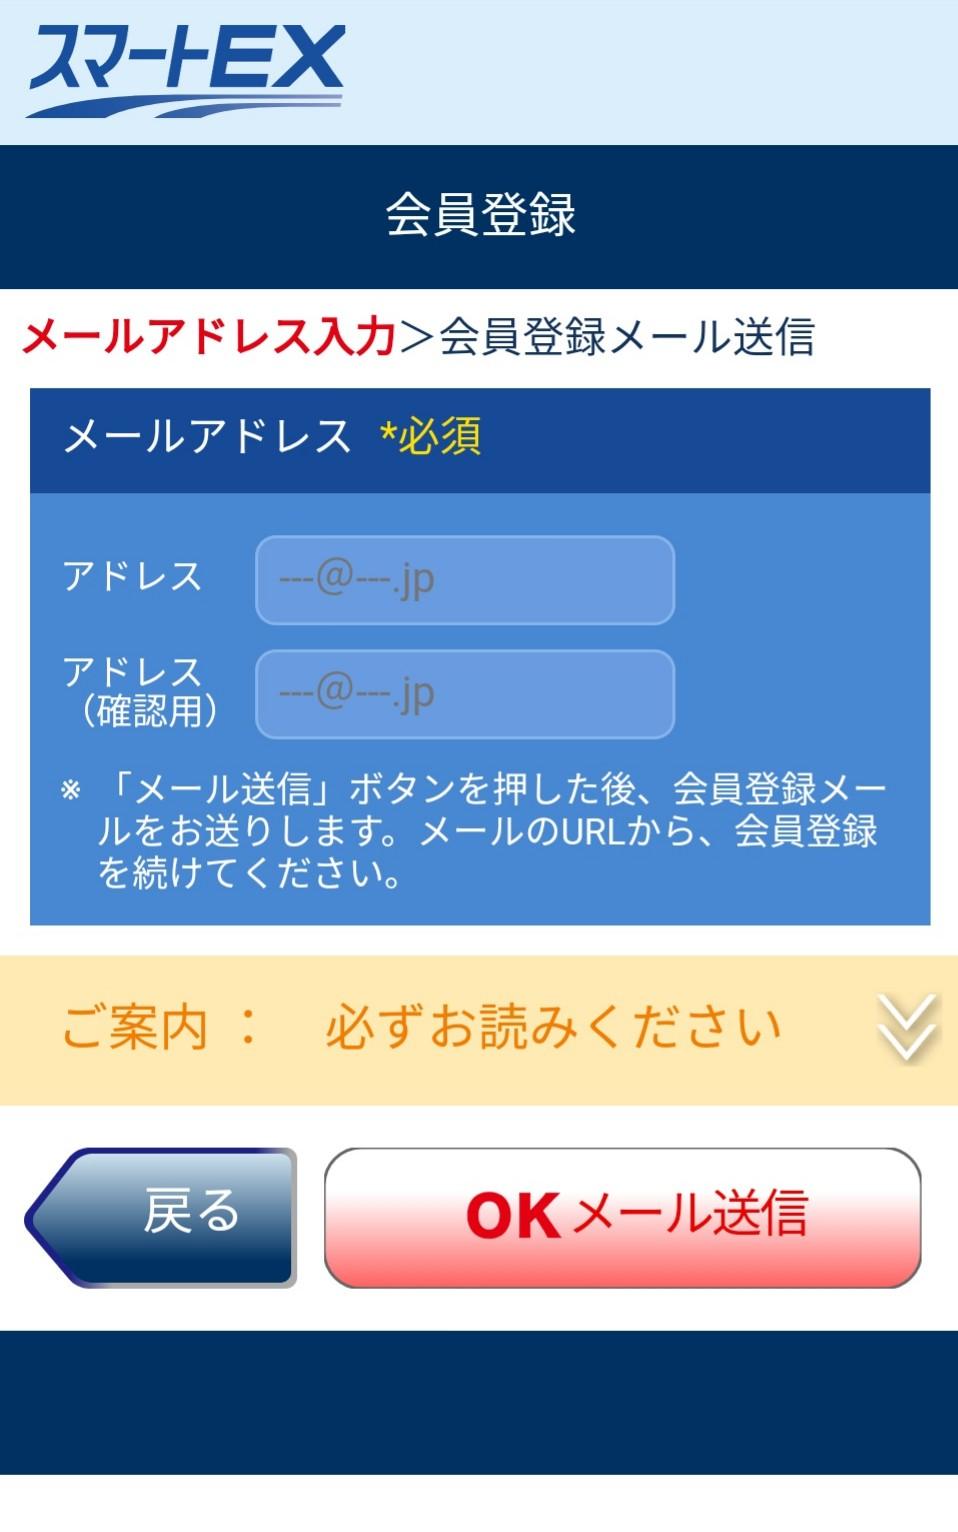 Ex アプリ スマート